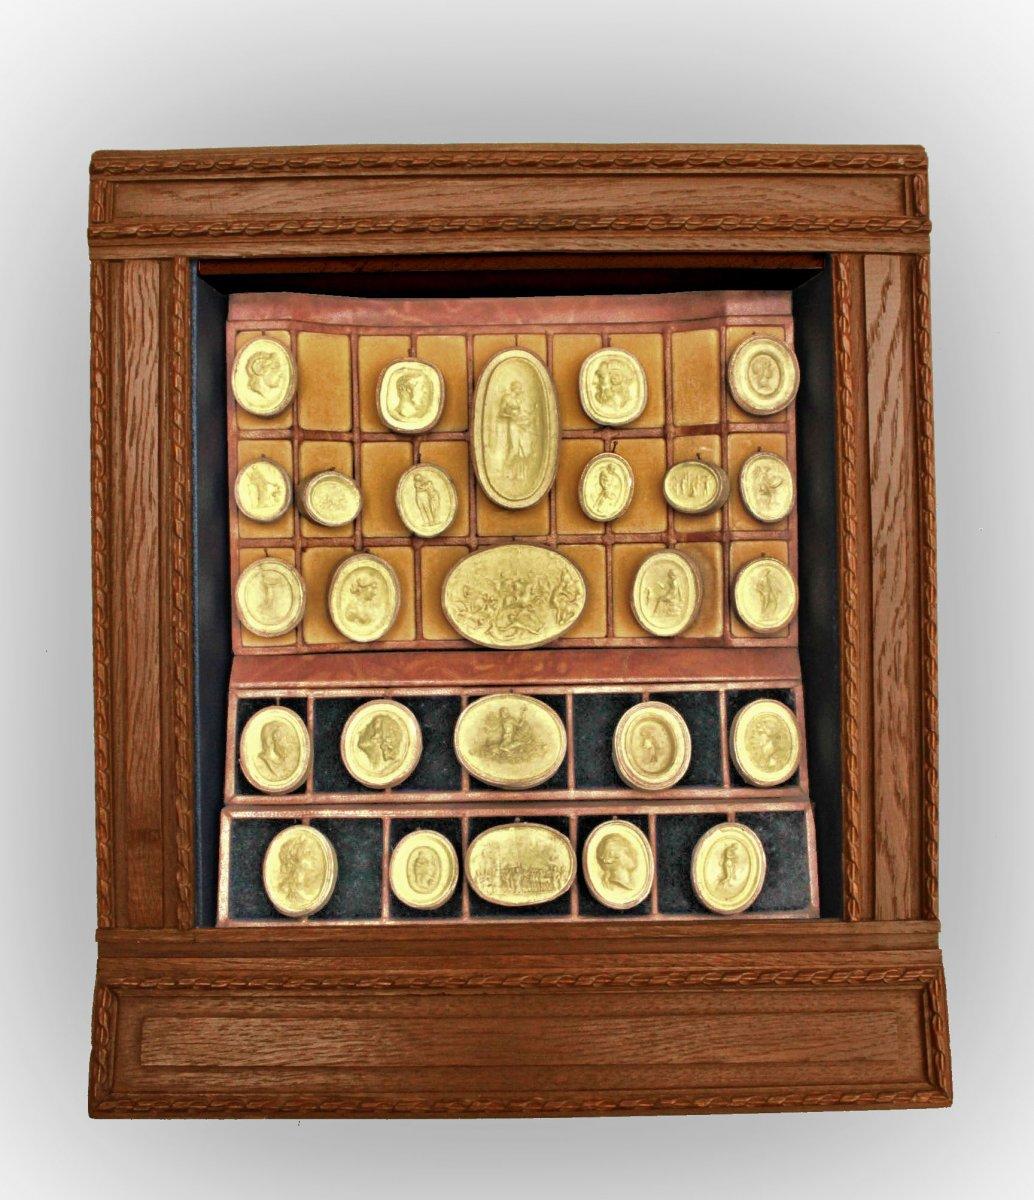 Collection d'Empreintes d'Intailles XIXe